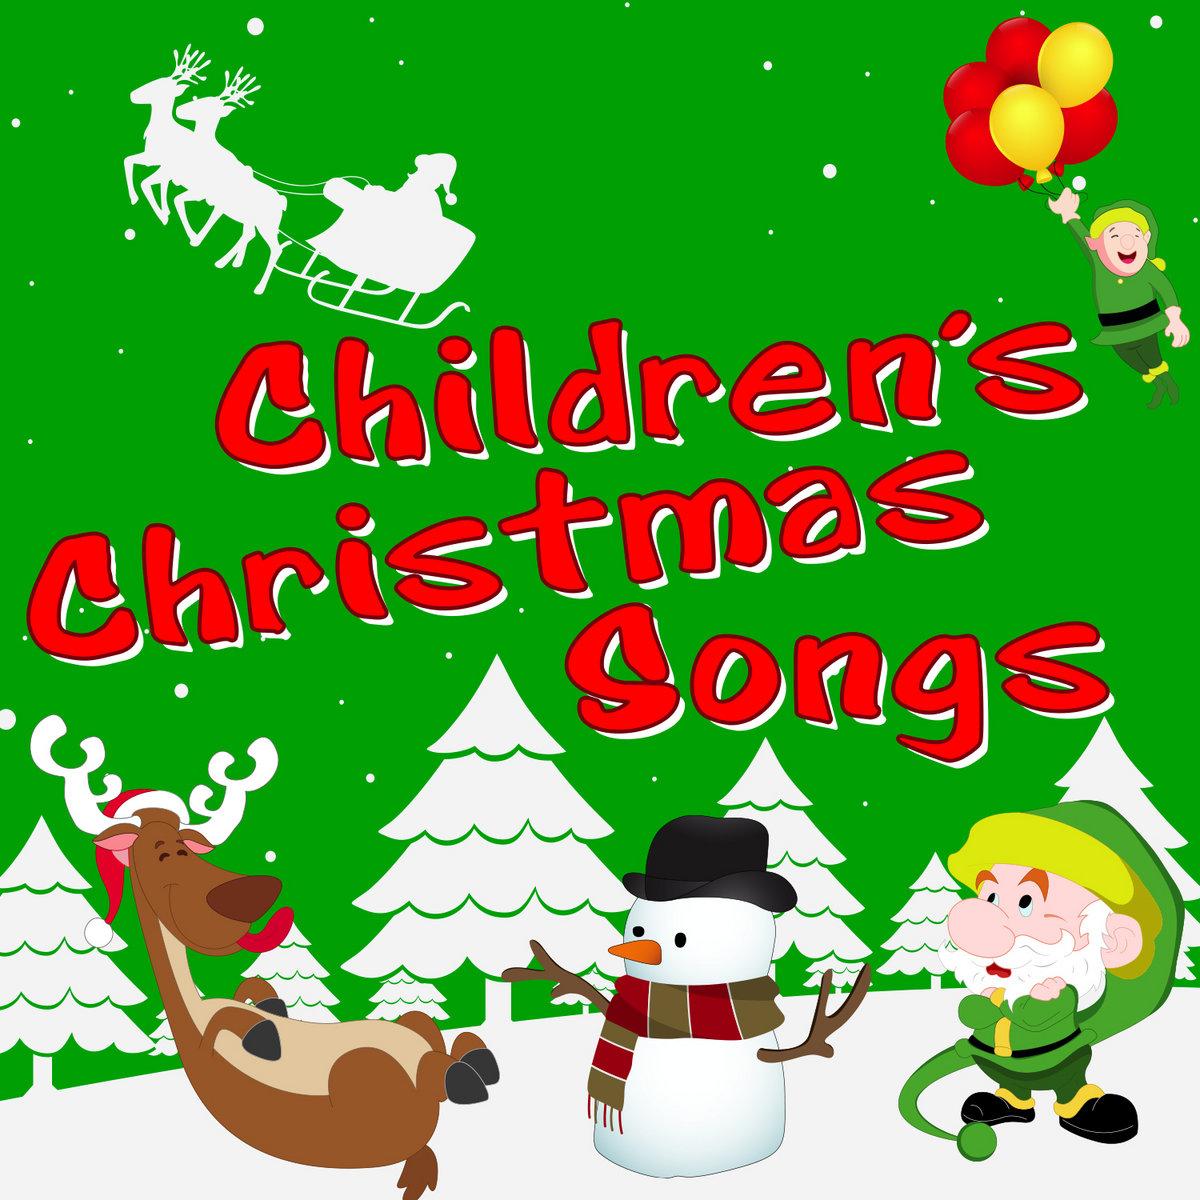 O Christmas Tree | Mezza Music